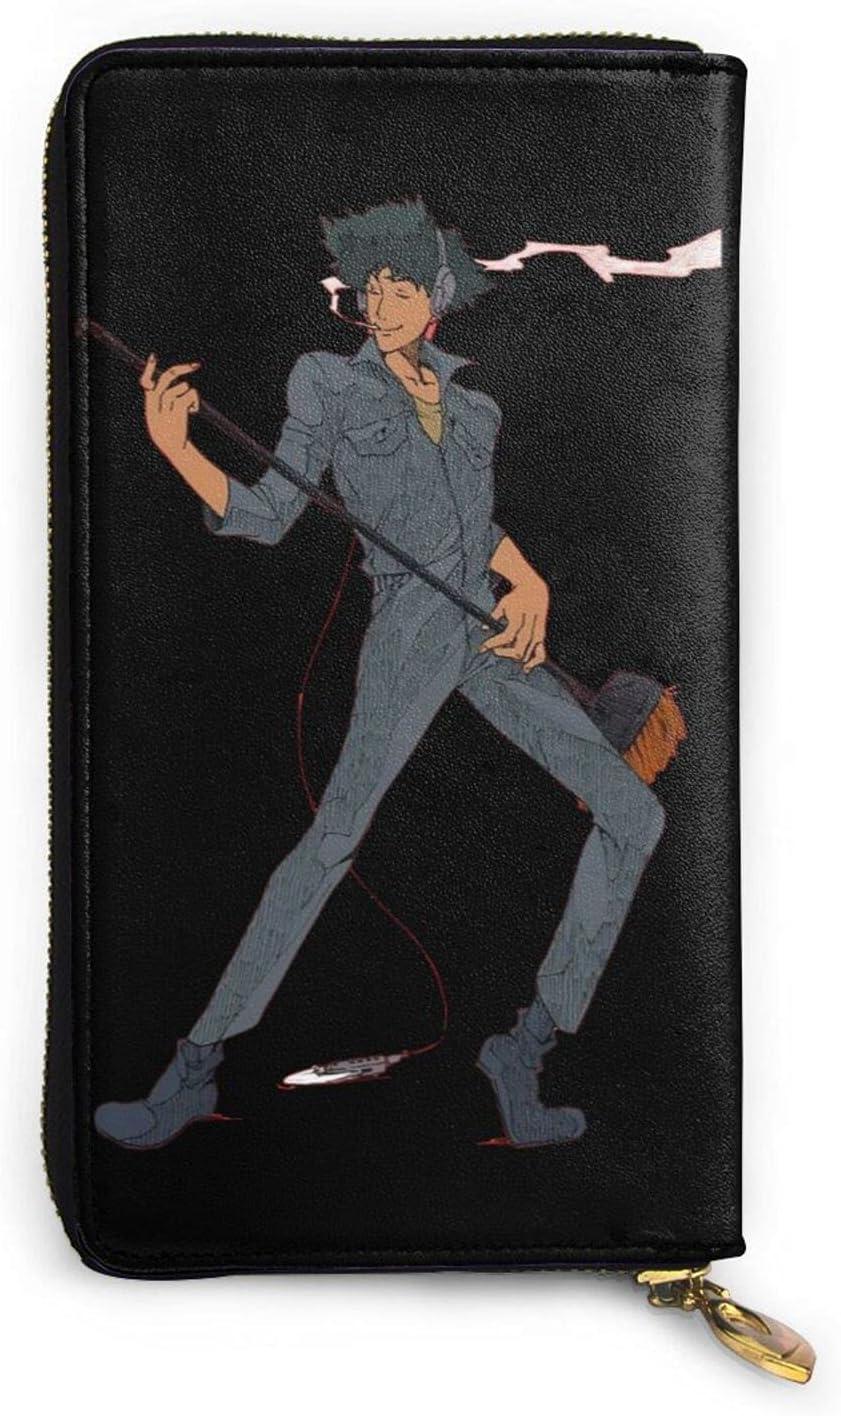 Cowboy Bebop Spike Spiegel Under blast sales Anime Online limited product Wallet Men Leather Cartoon Wome